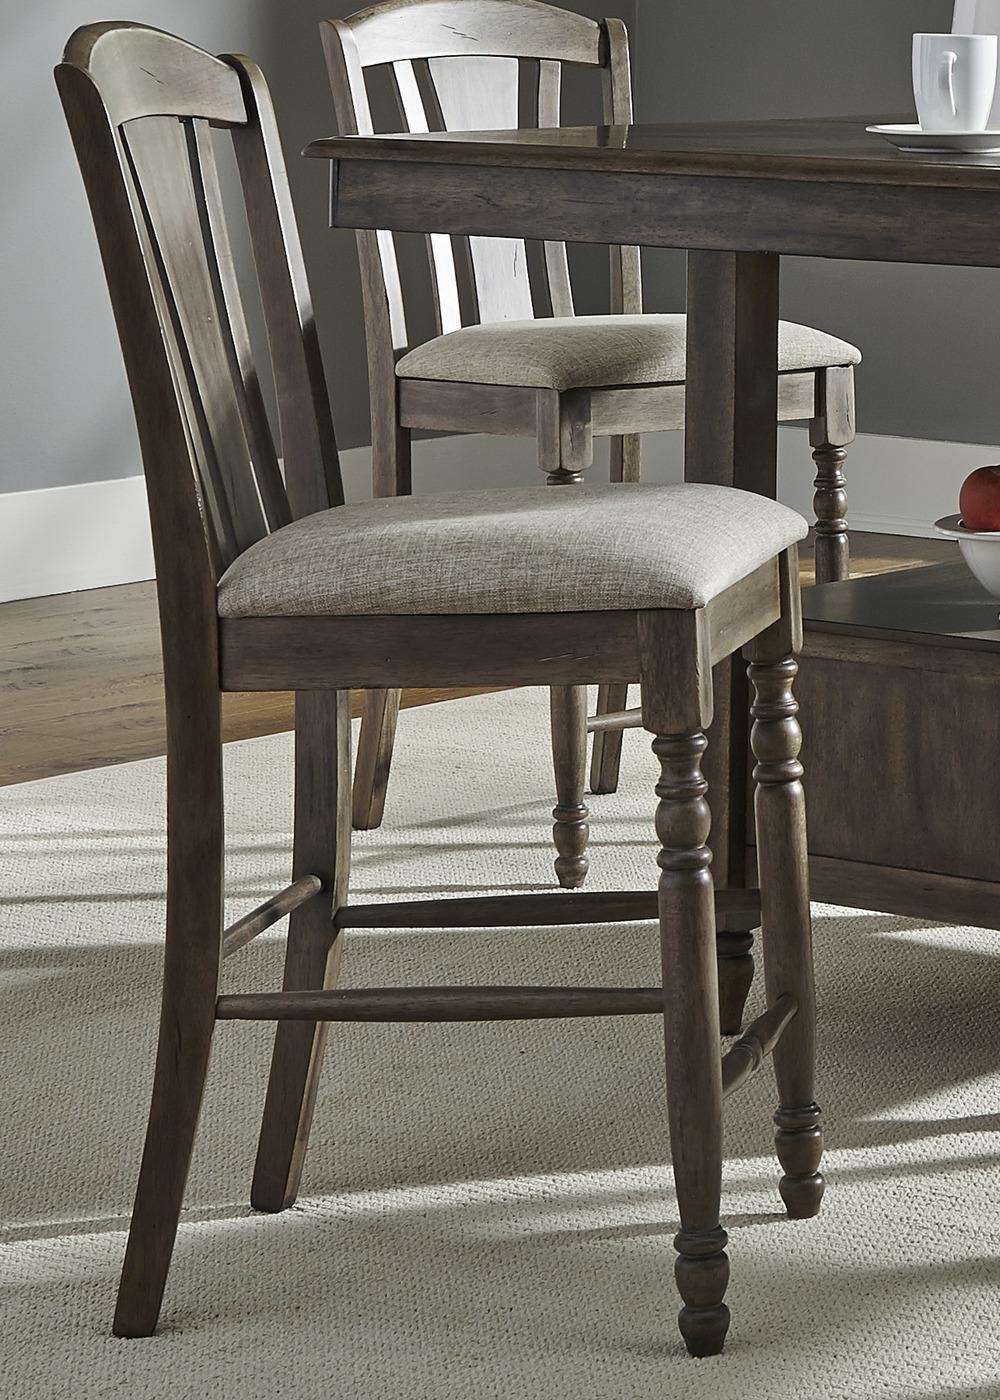 Liberty Furniture - Slat-Back Barstool